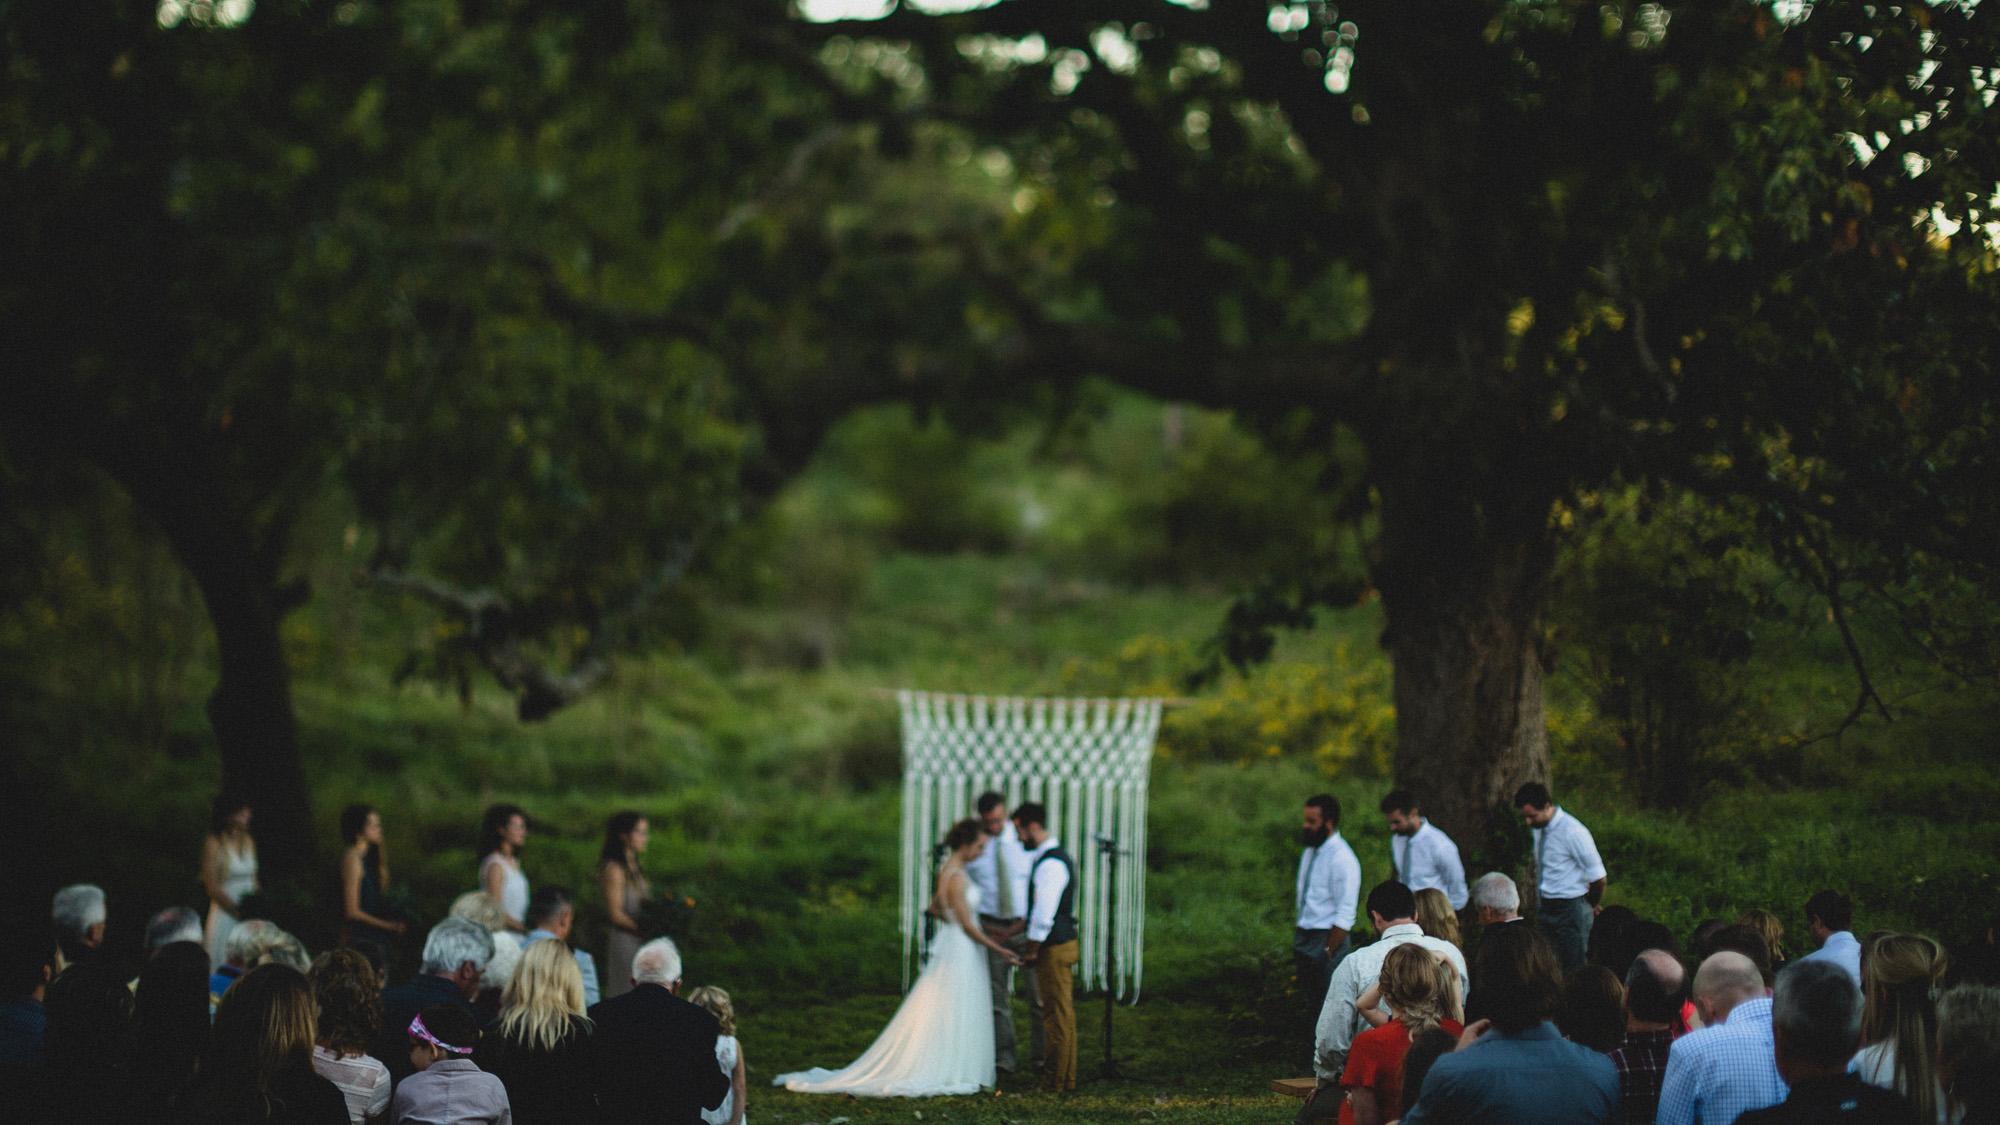 alec_vanderboom_springfield_missouri_wedding-0068.jpg